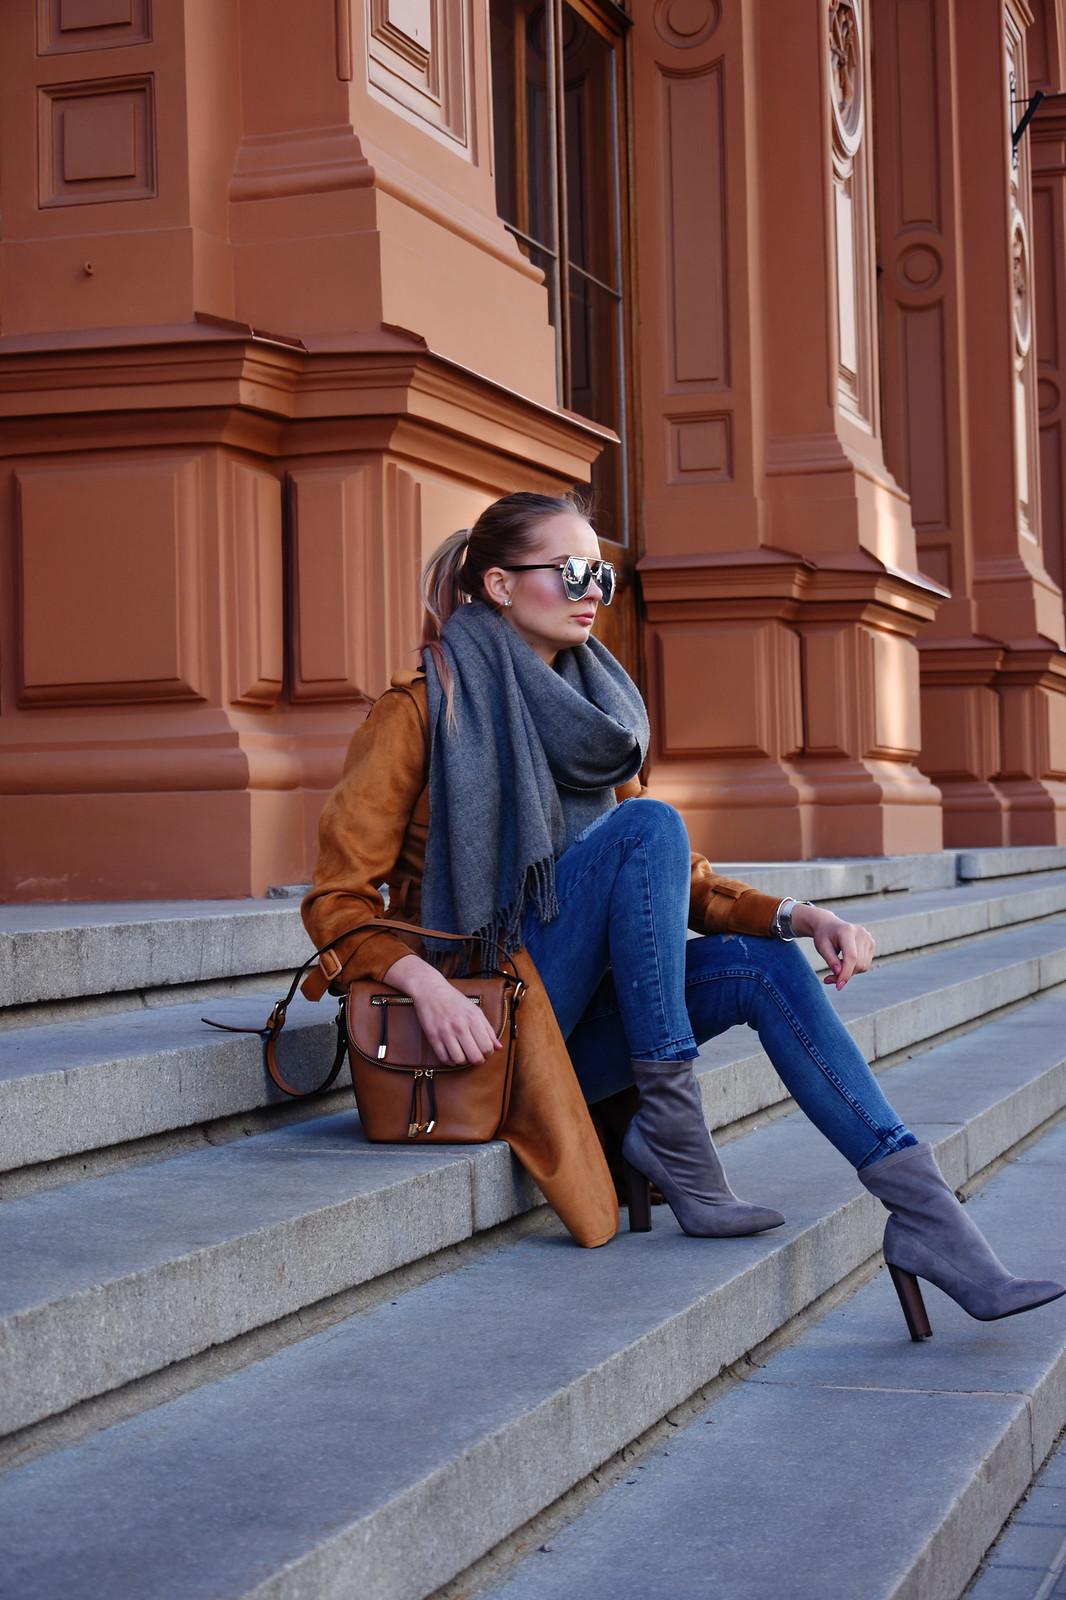 Latvian fashion blogger